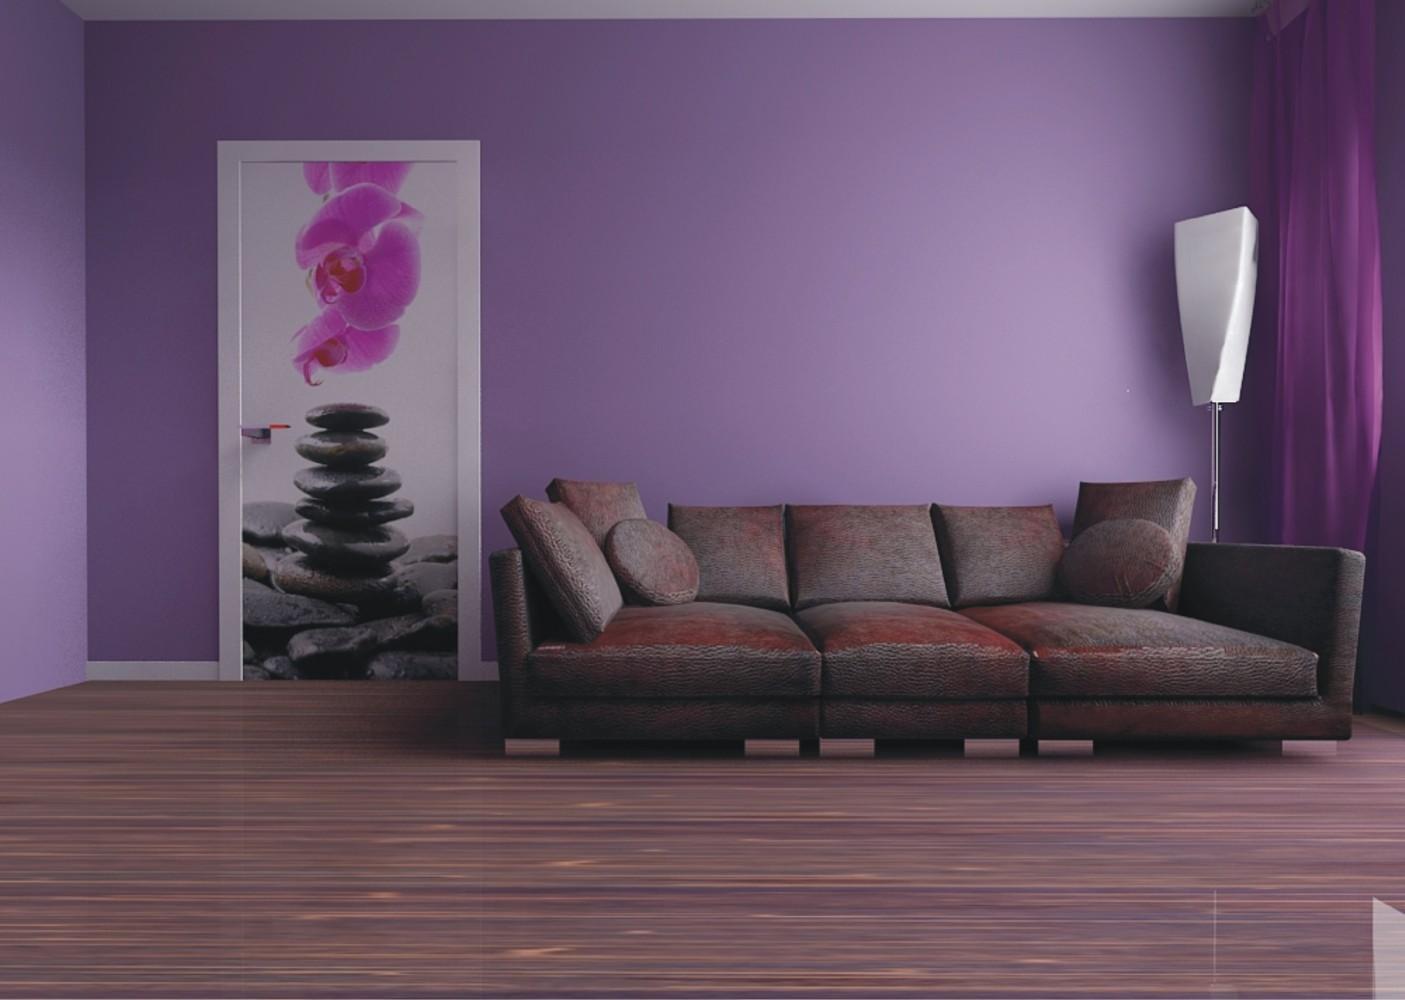 T rtapete fototapete tapete lila orchidee steine wellness - Colores de pintura para paredes interiores ...